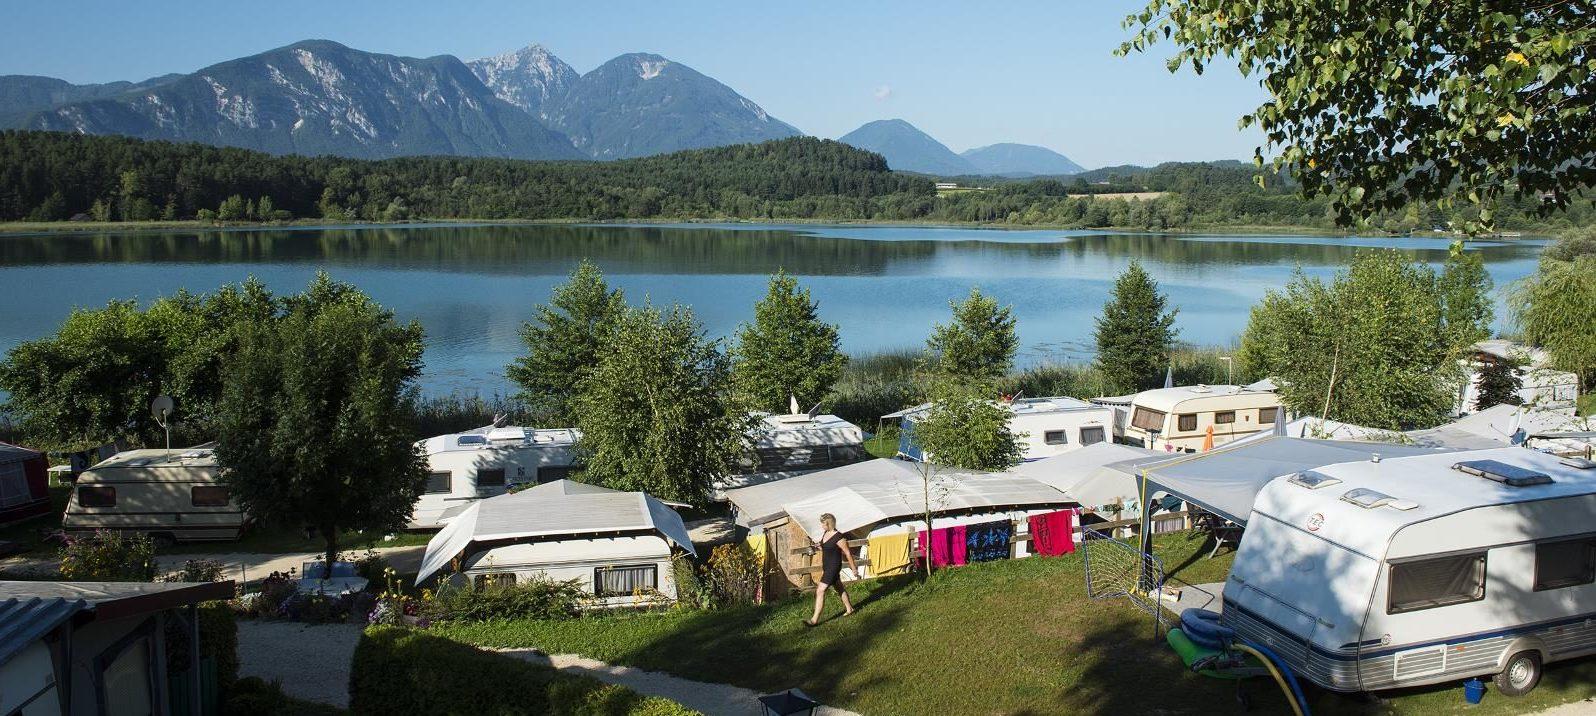 Camping IlsenhofObersammelsdorfTurnerseeBezirk VölkermarktKärnten